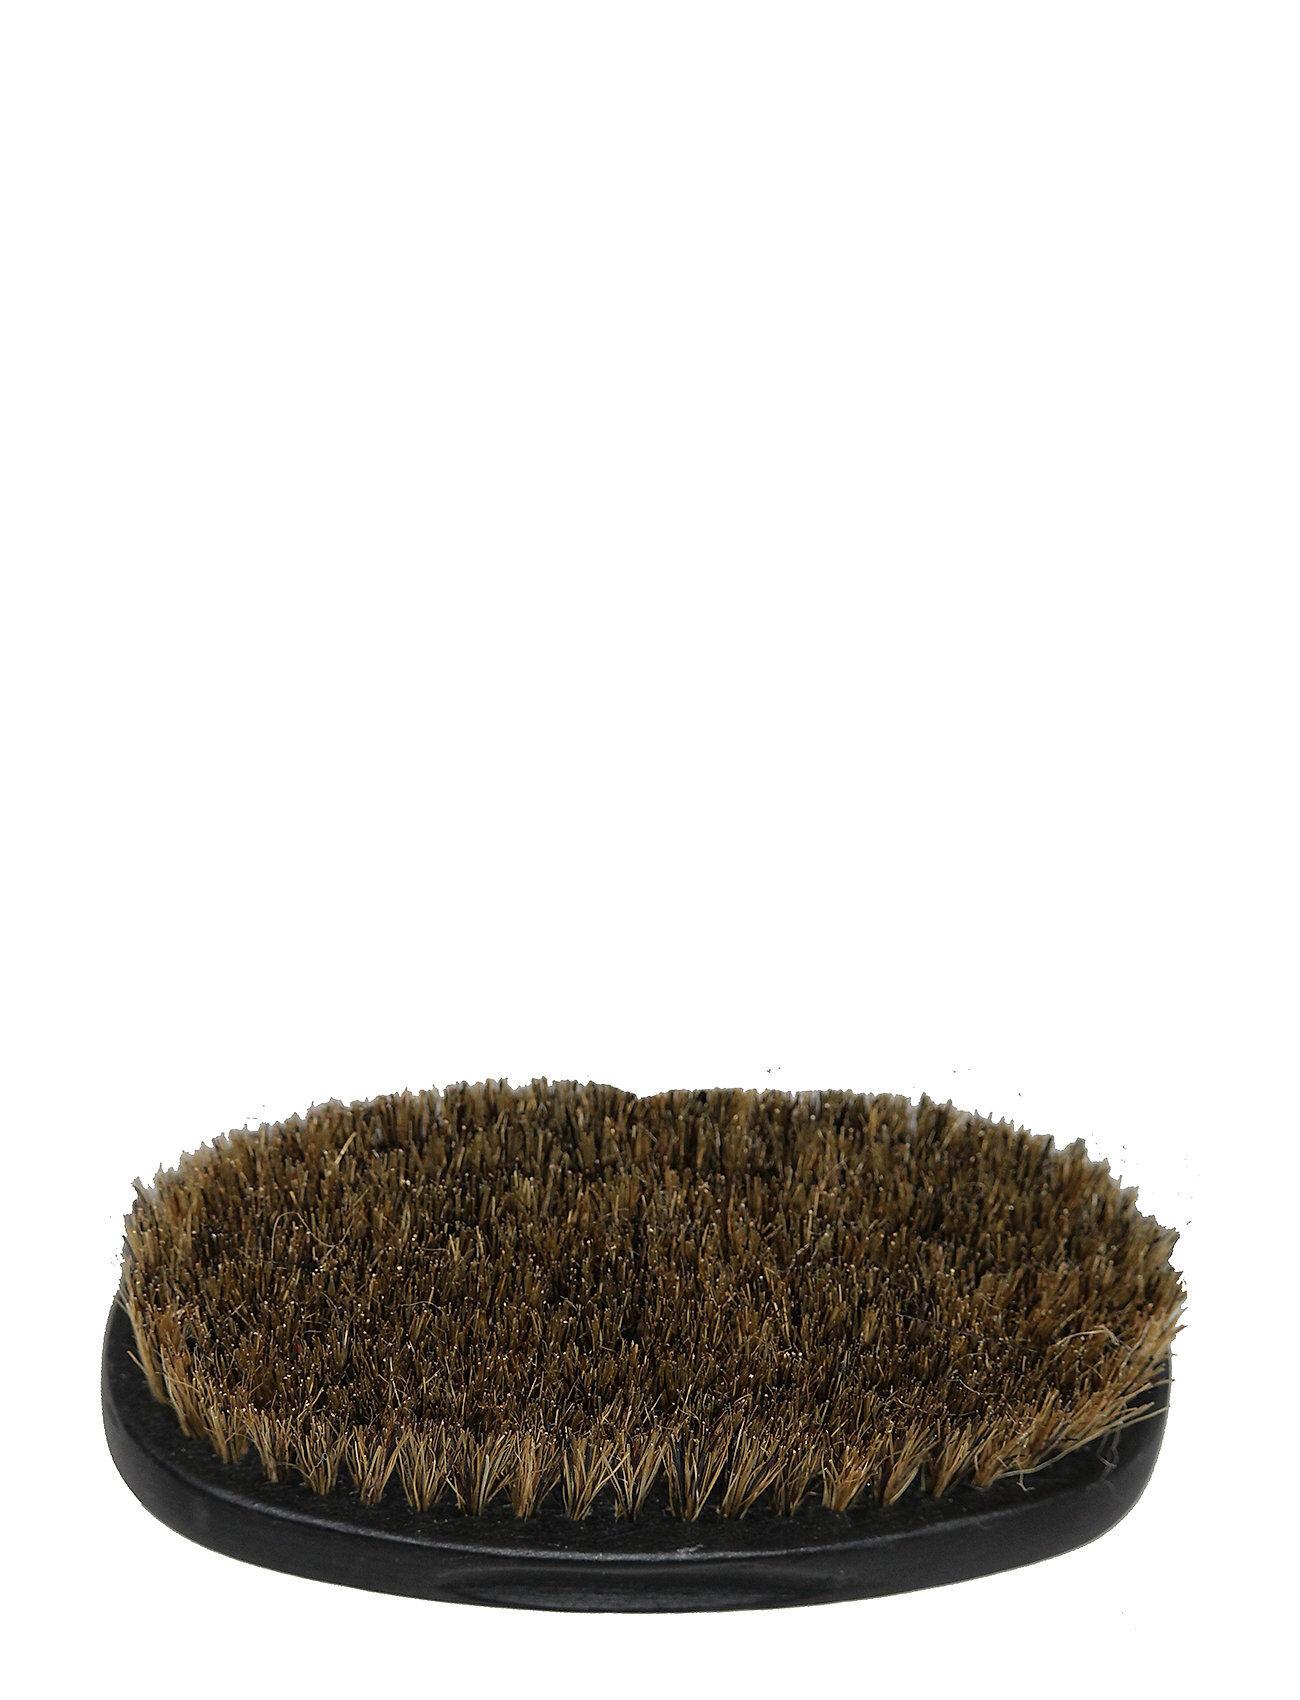 Mountaineer Brand Military Oval Boar Beard Brush Beauty MEN Shaving Products Shaving Brush Ruskea Mountaineer Brand